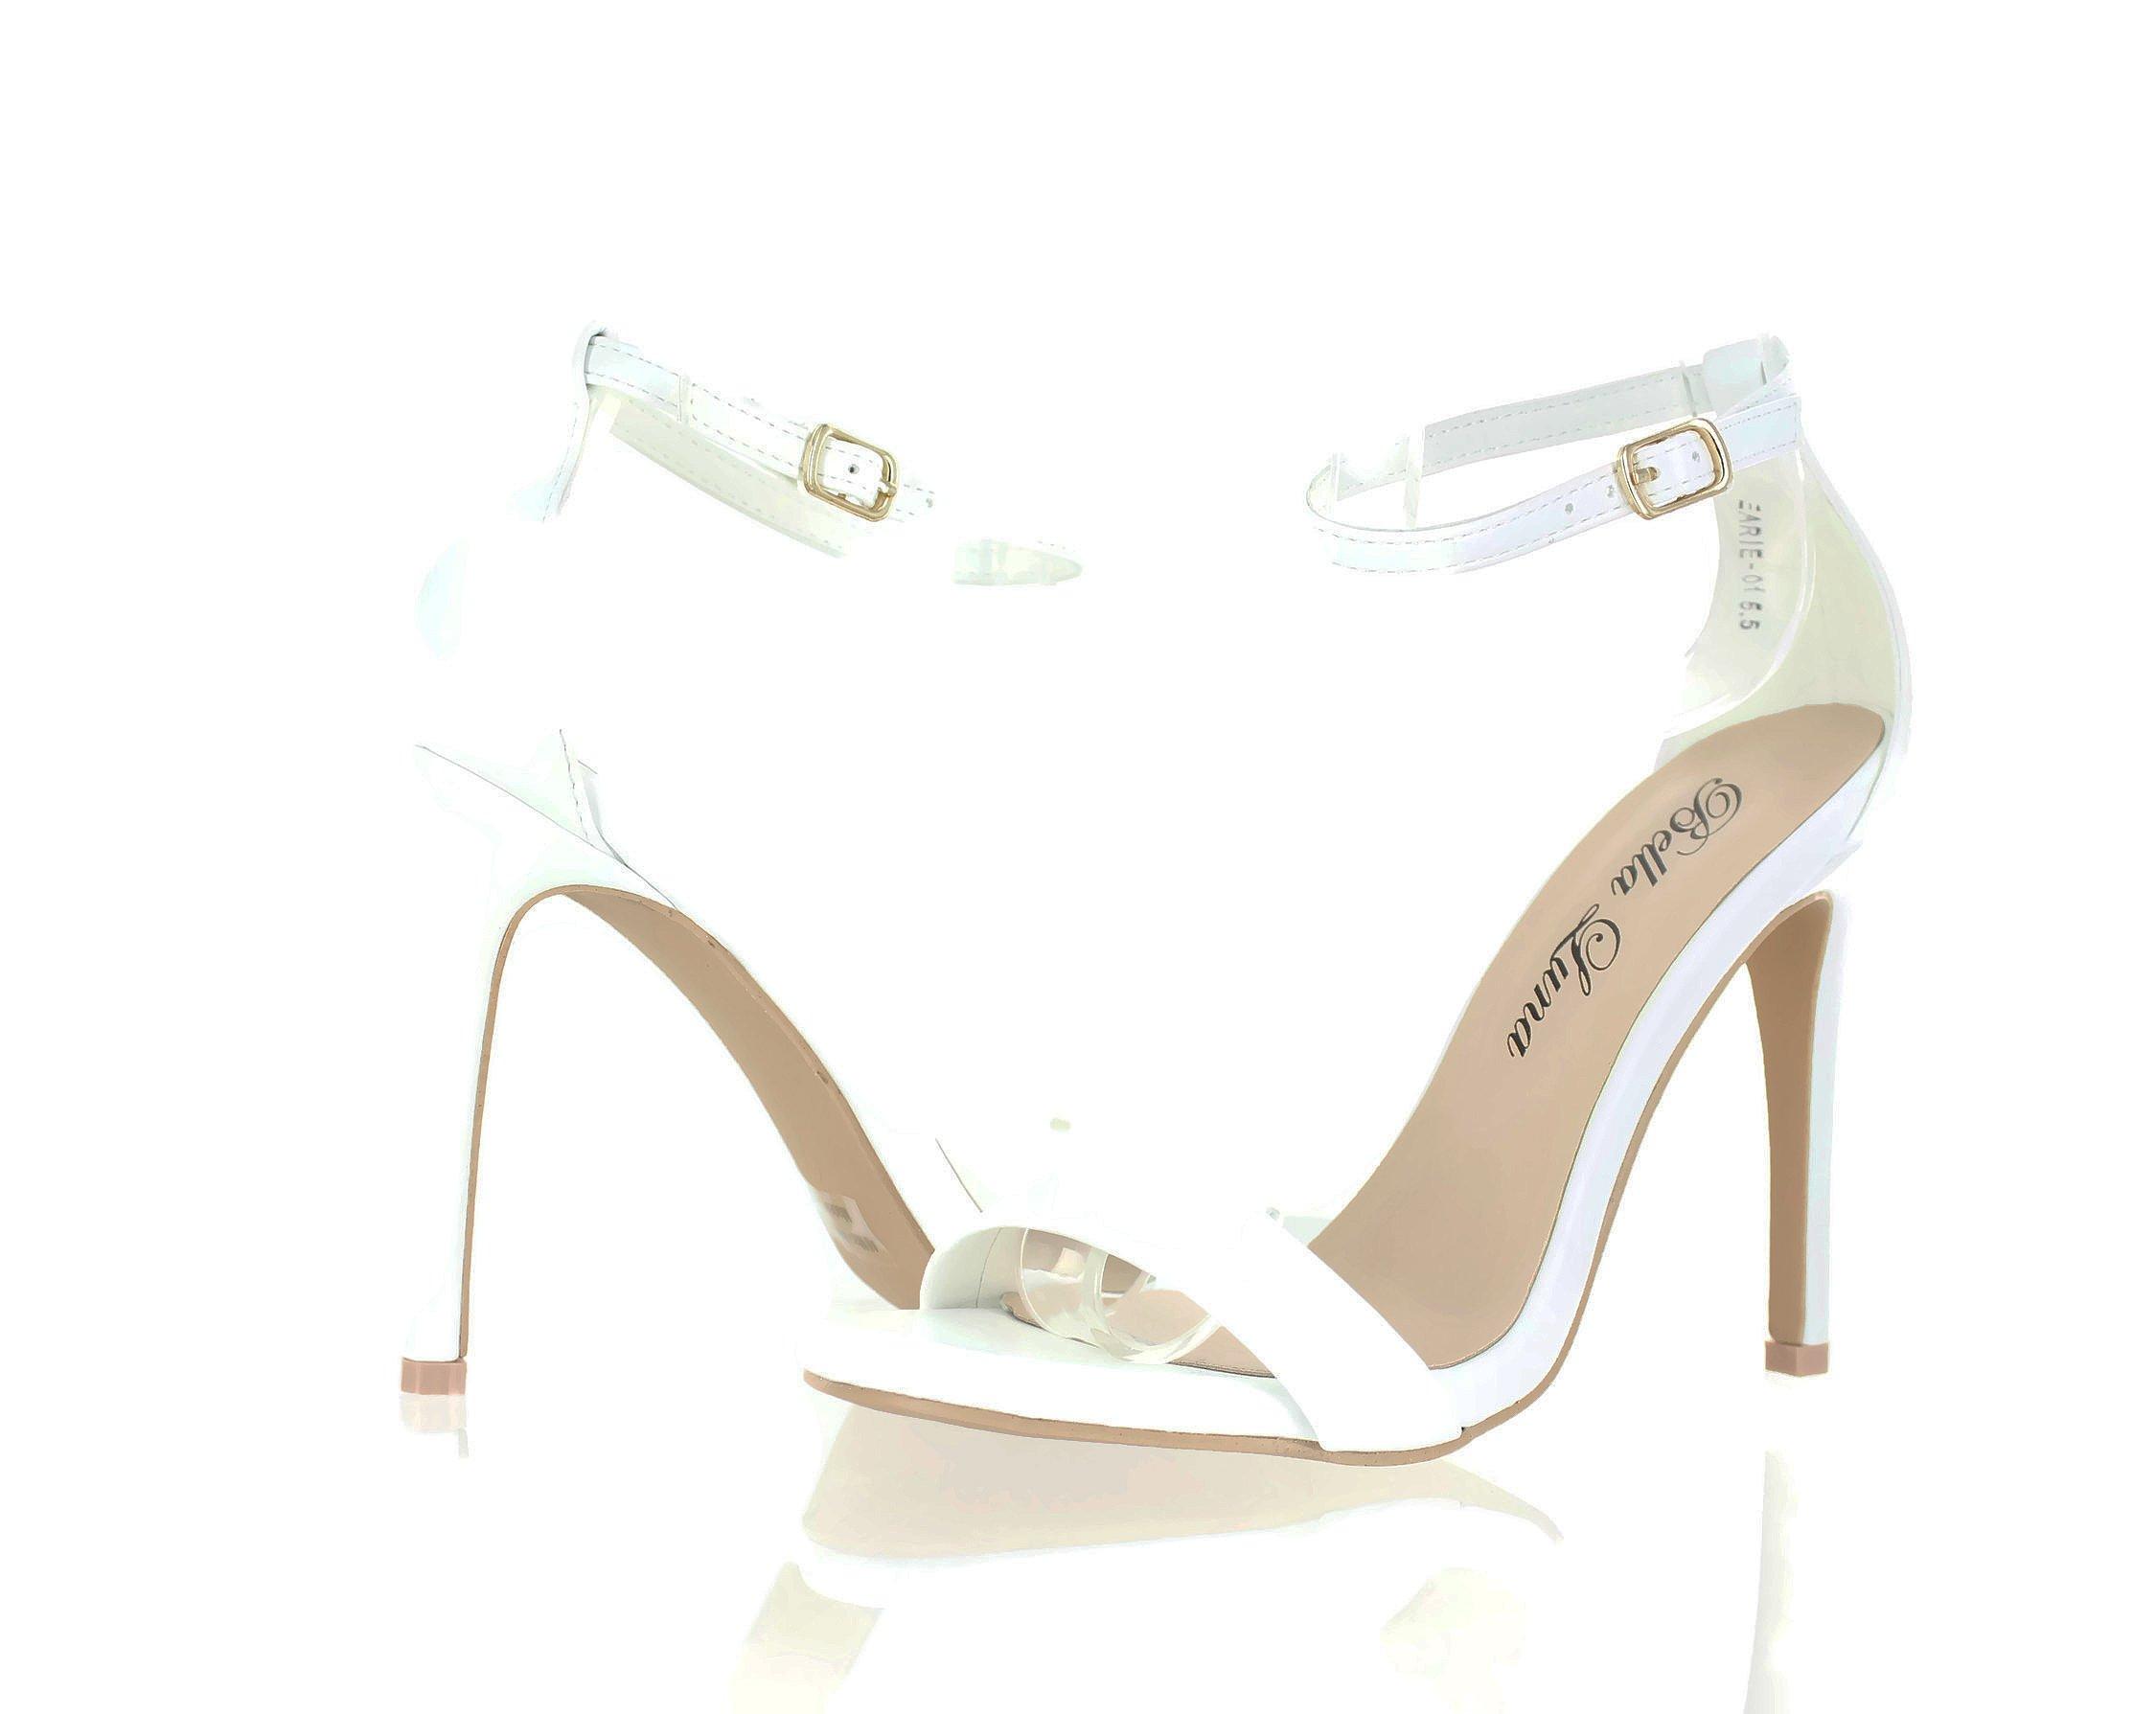 Urban Heel Metallic Ankle Strap Open Toe Stiletto Heel Premier Dream Comfort